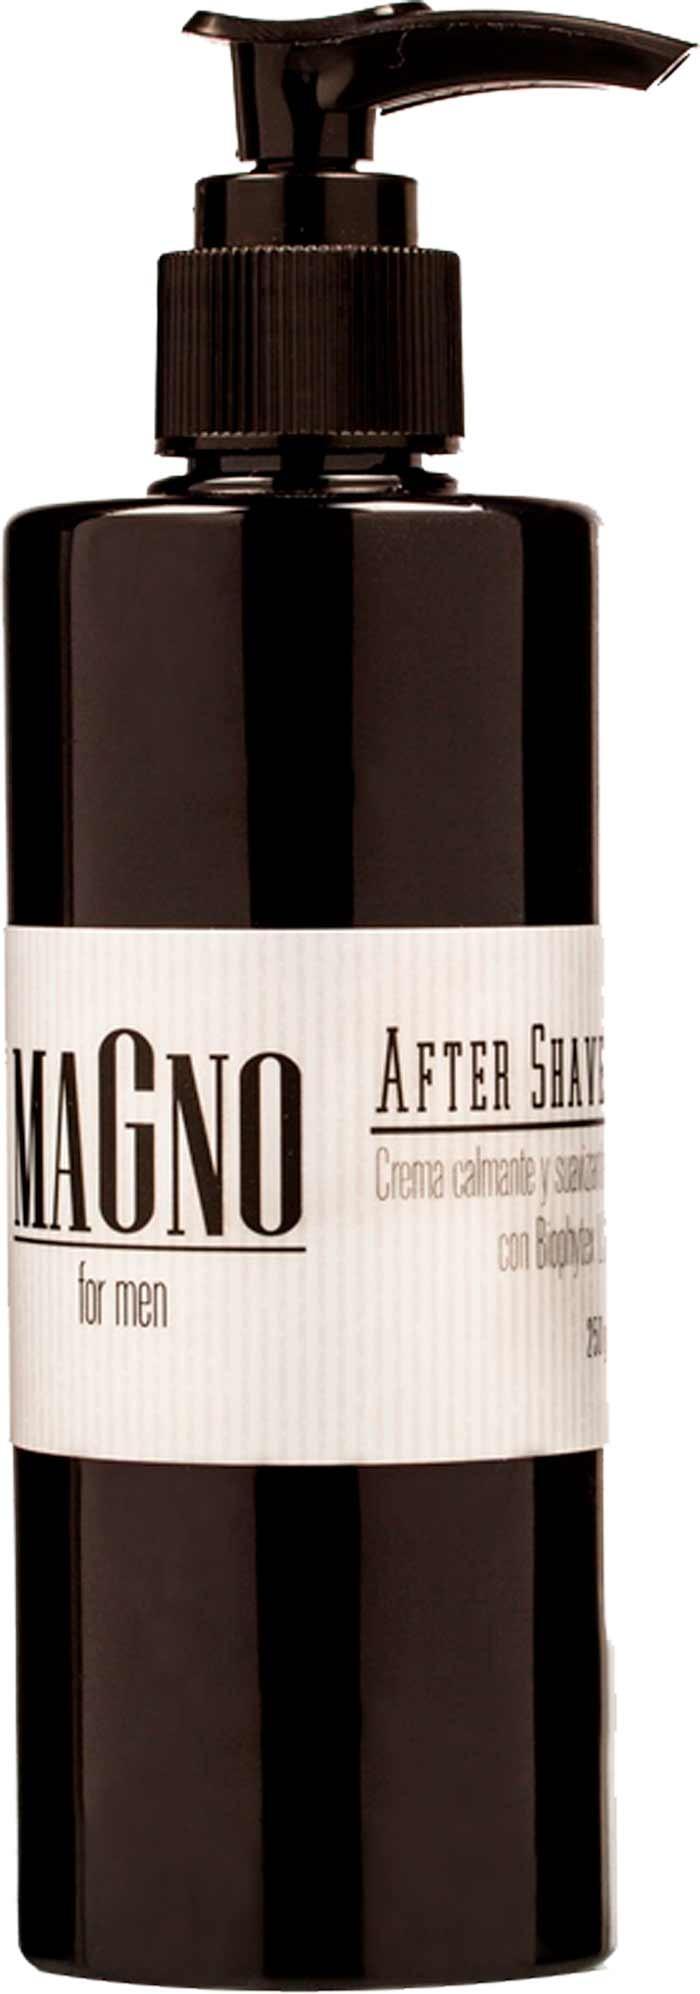 After Shave MAGNO 250g